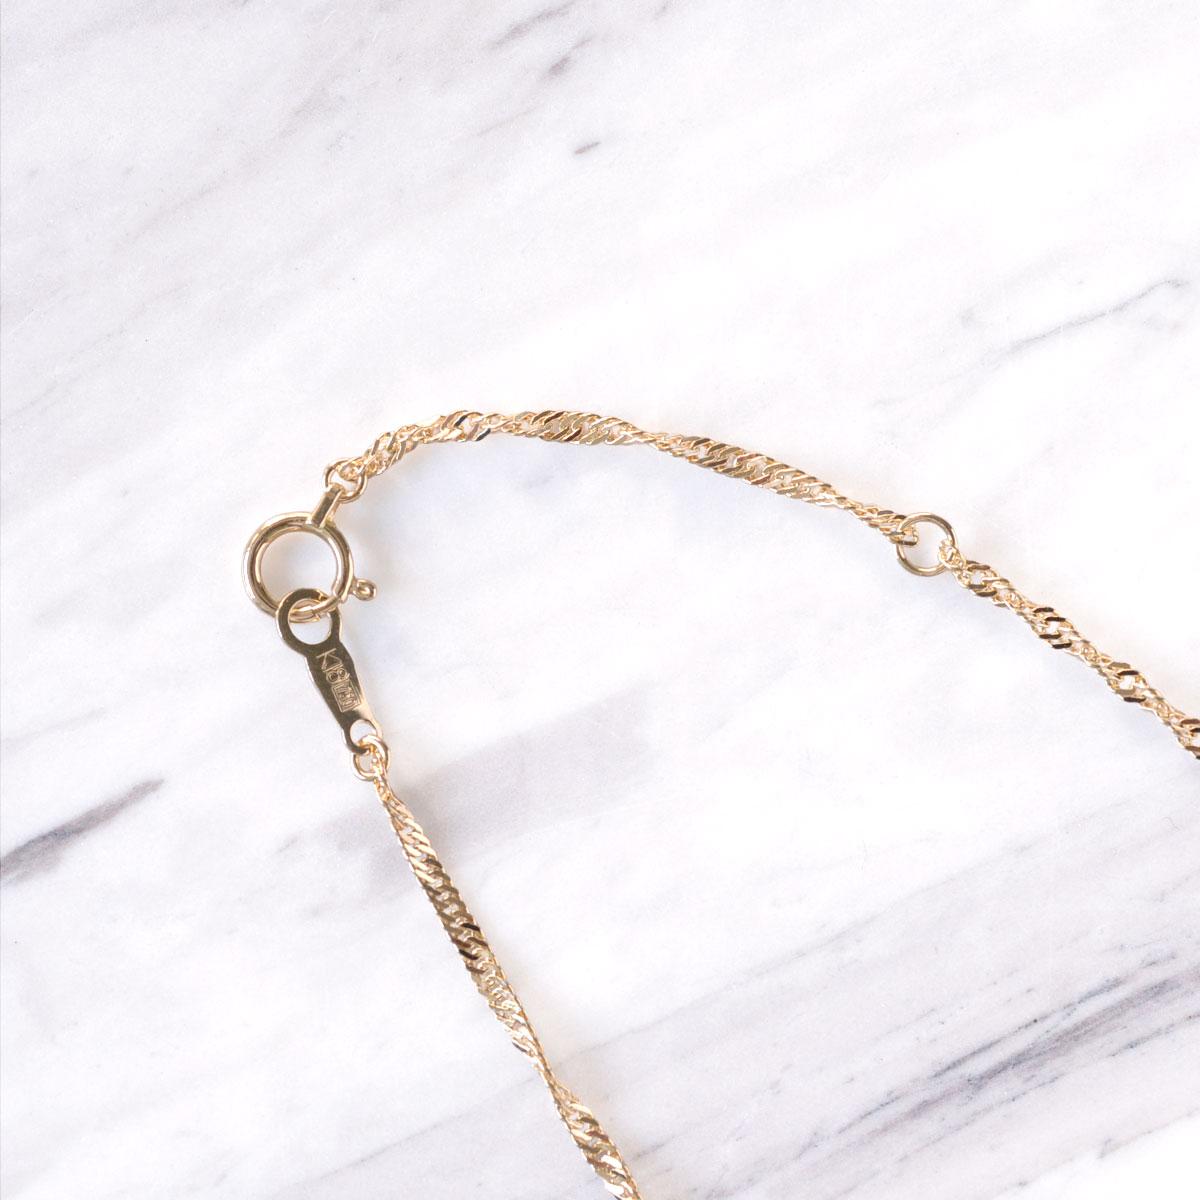 K18 イエローゴールド スクリュー 幅1.4mm チェーン 40cm / プレゼント ギフト gold necklace ach1612